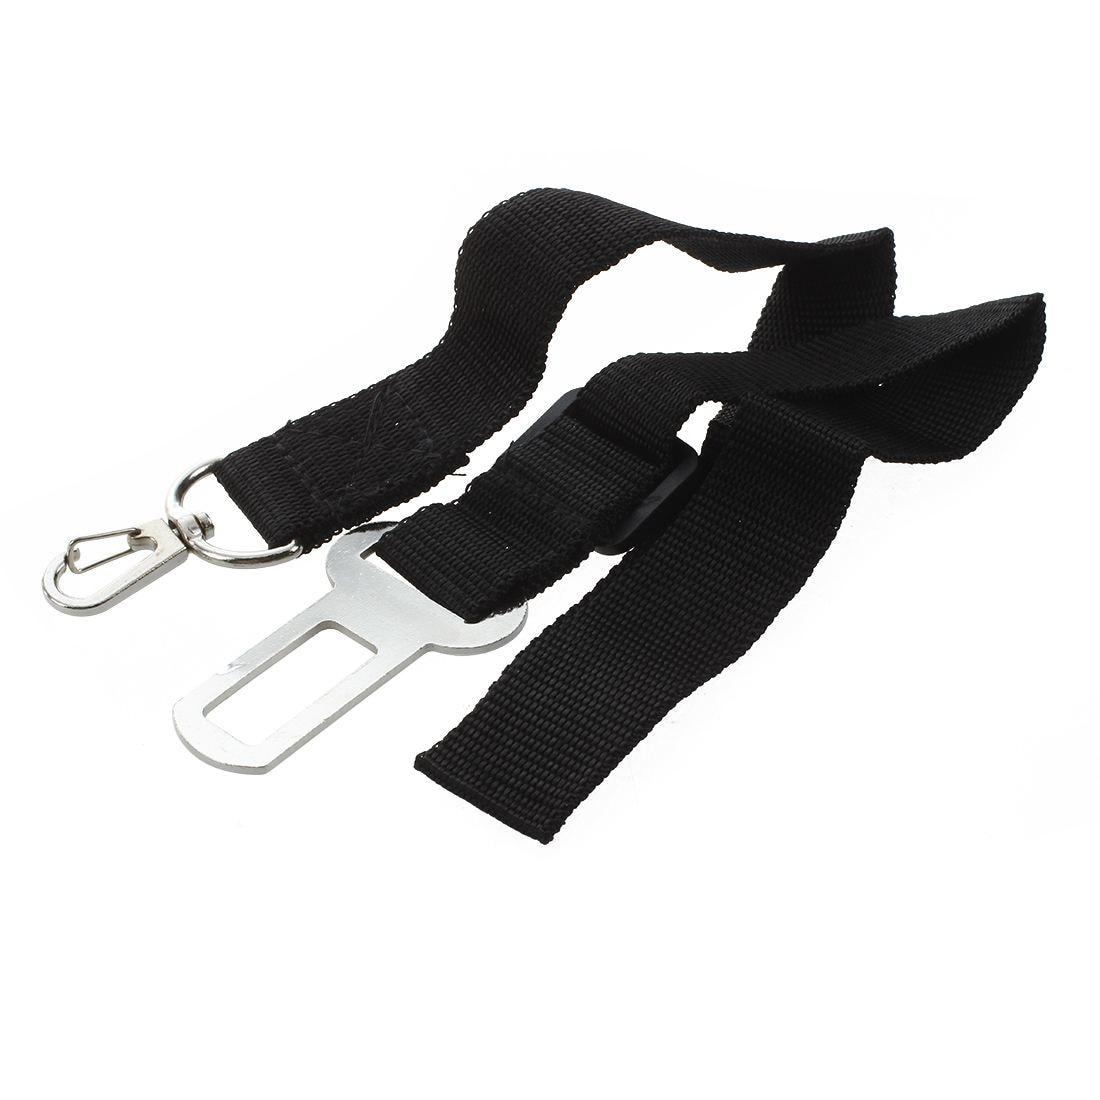 Hot Sale Adjustable Pet Cat Dog Safety Services Auto Safety Belt